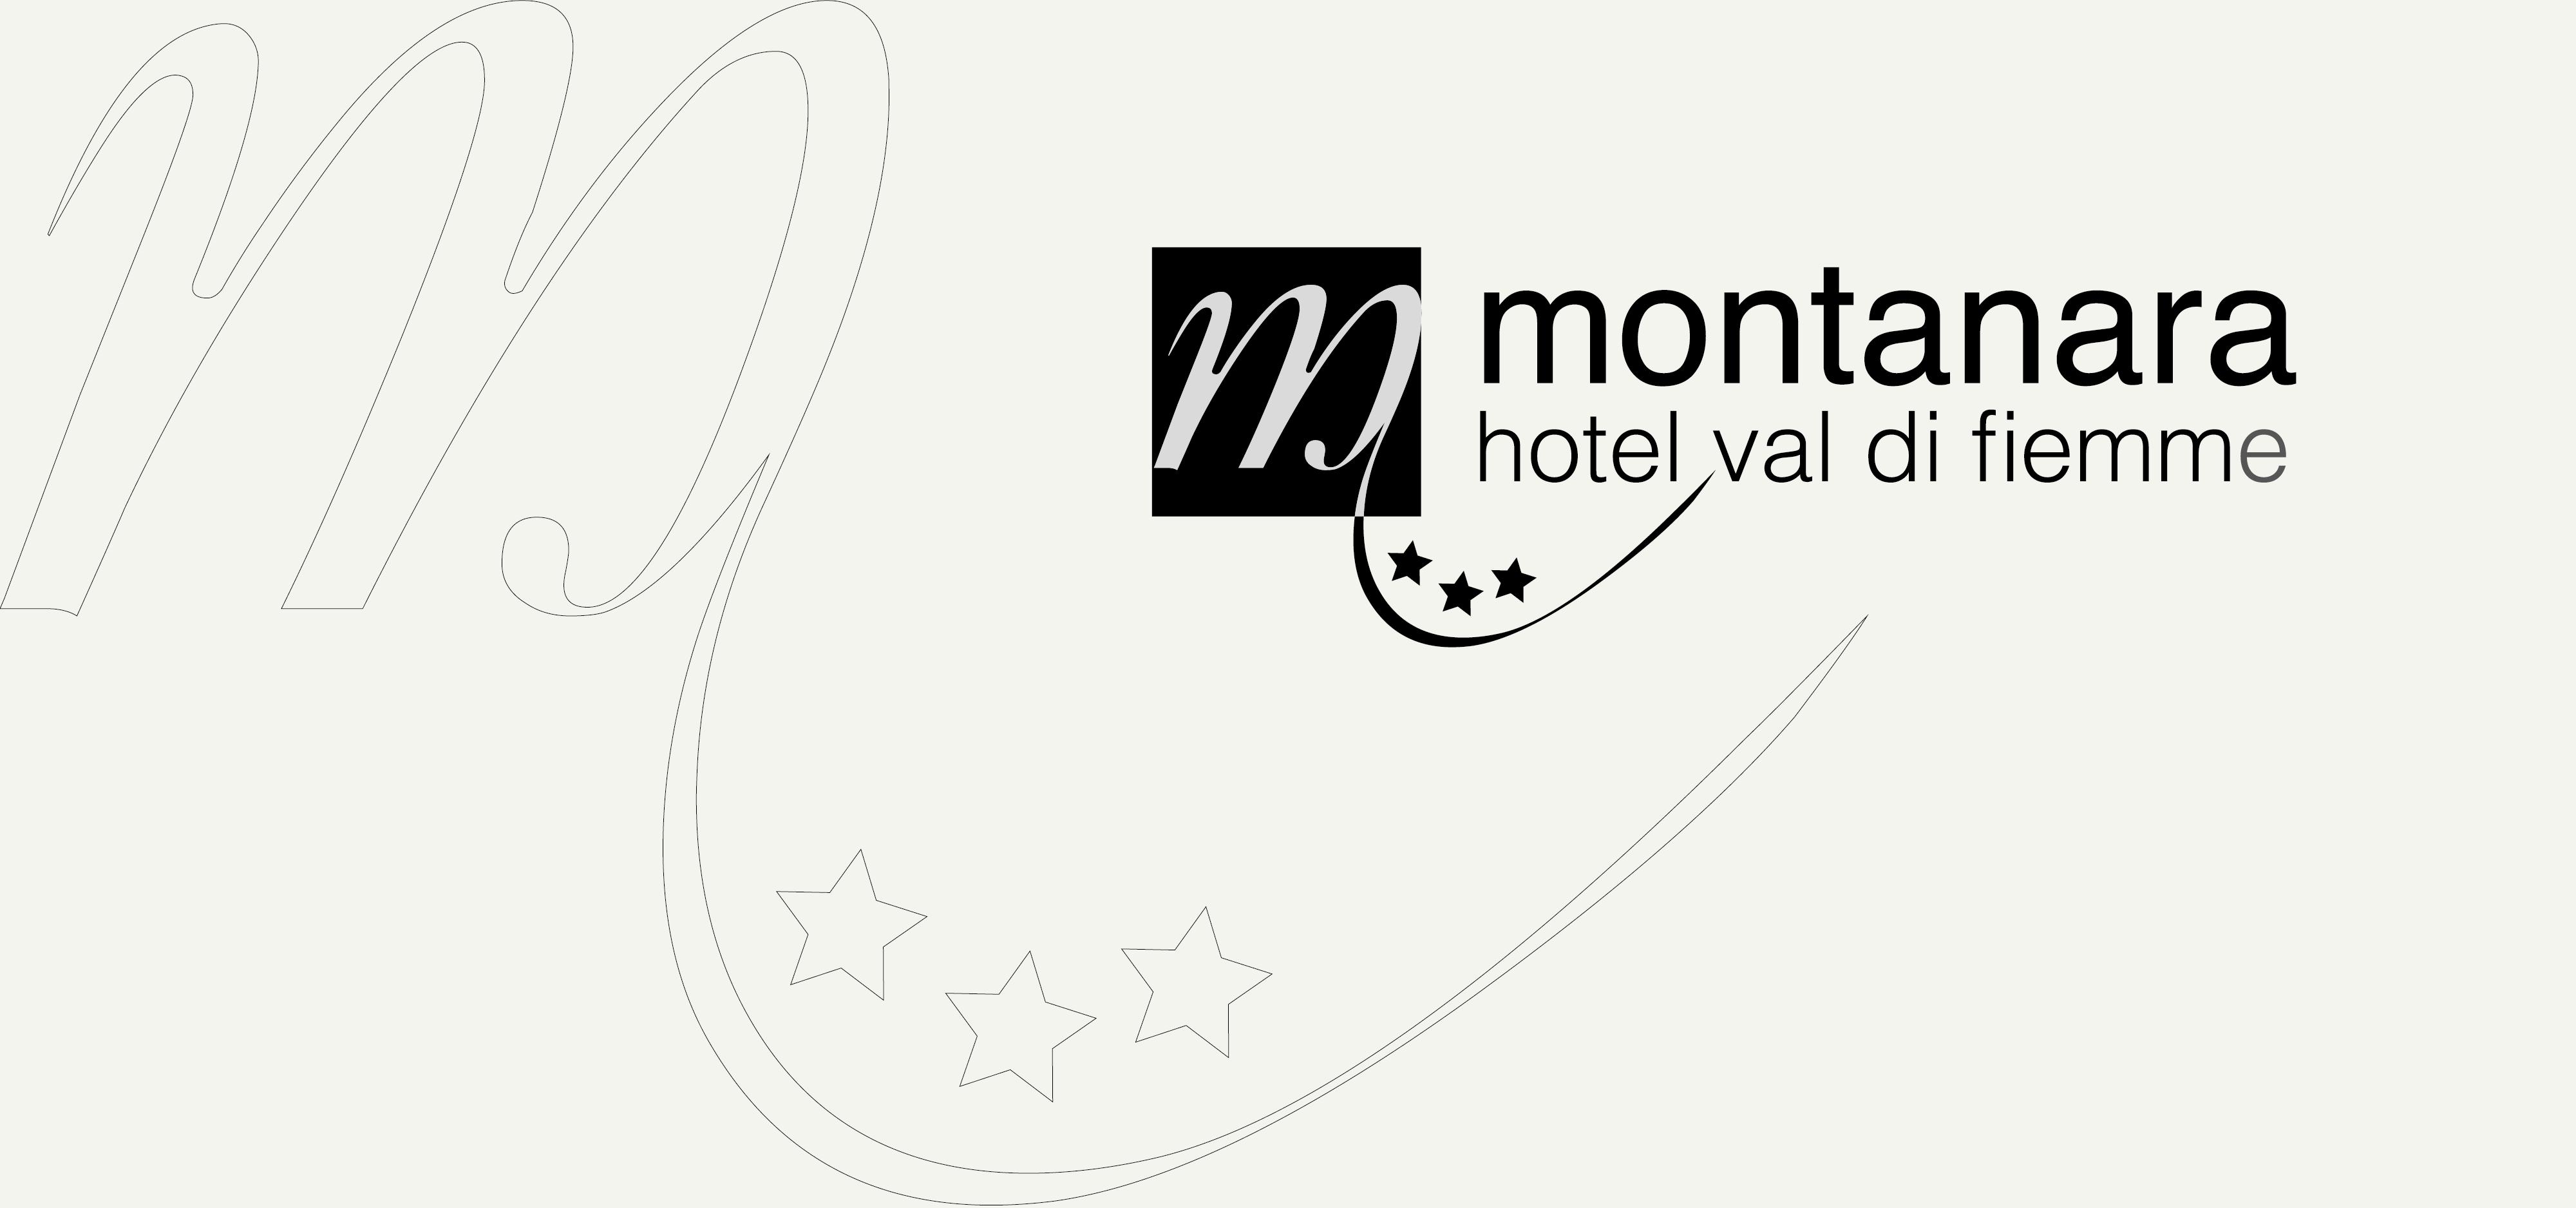 montanara-04